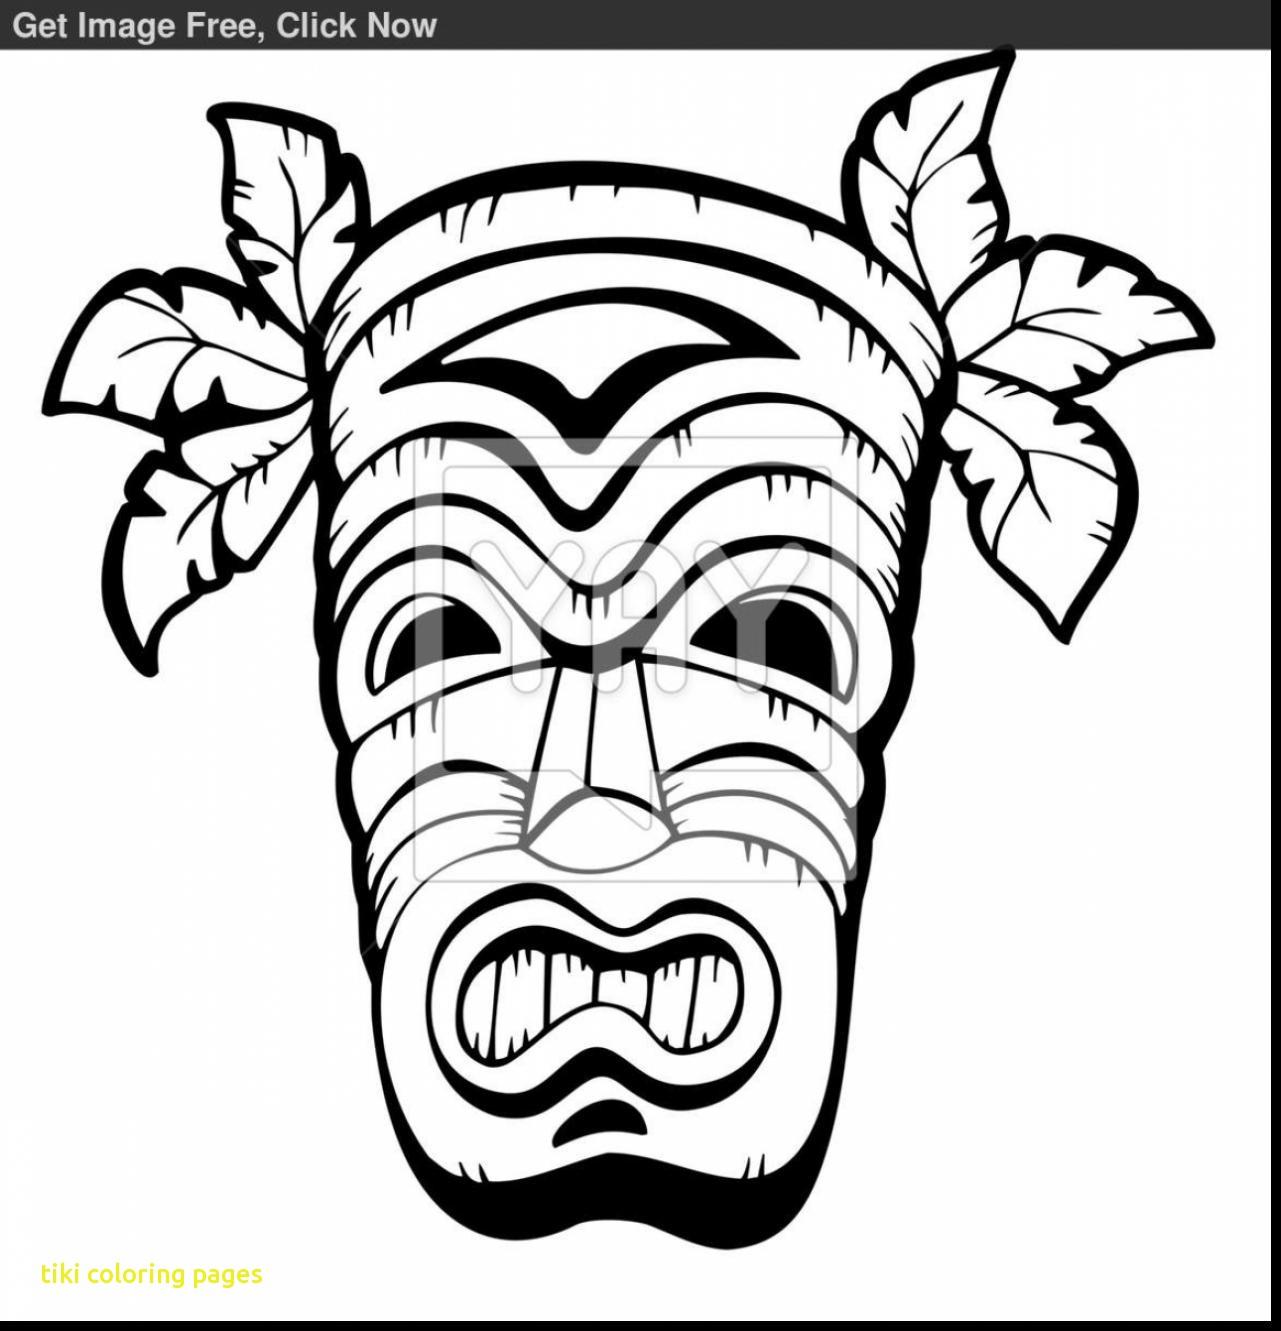 Tiki Head Drawing At Getdrawings